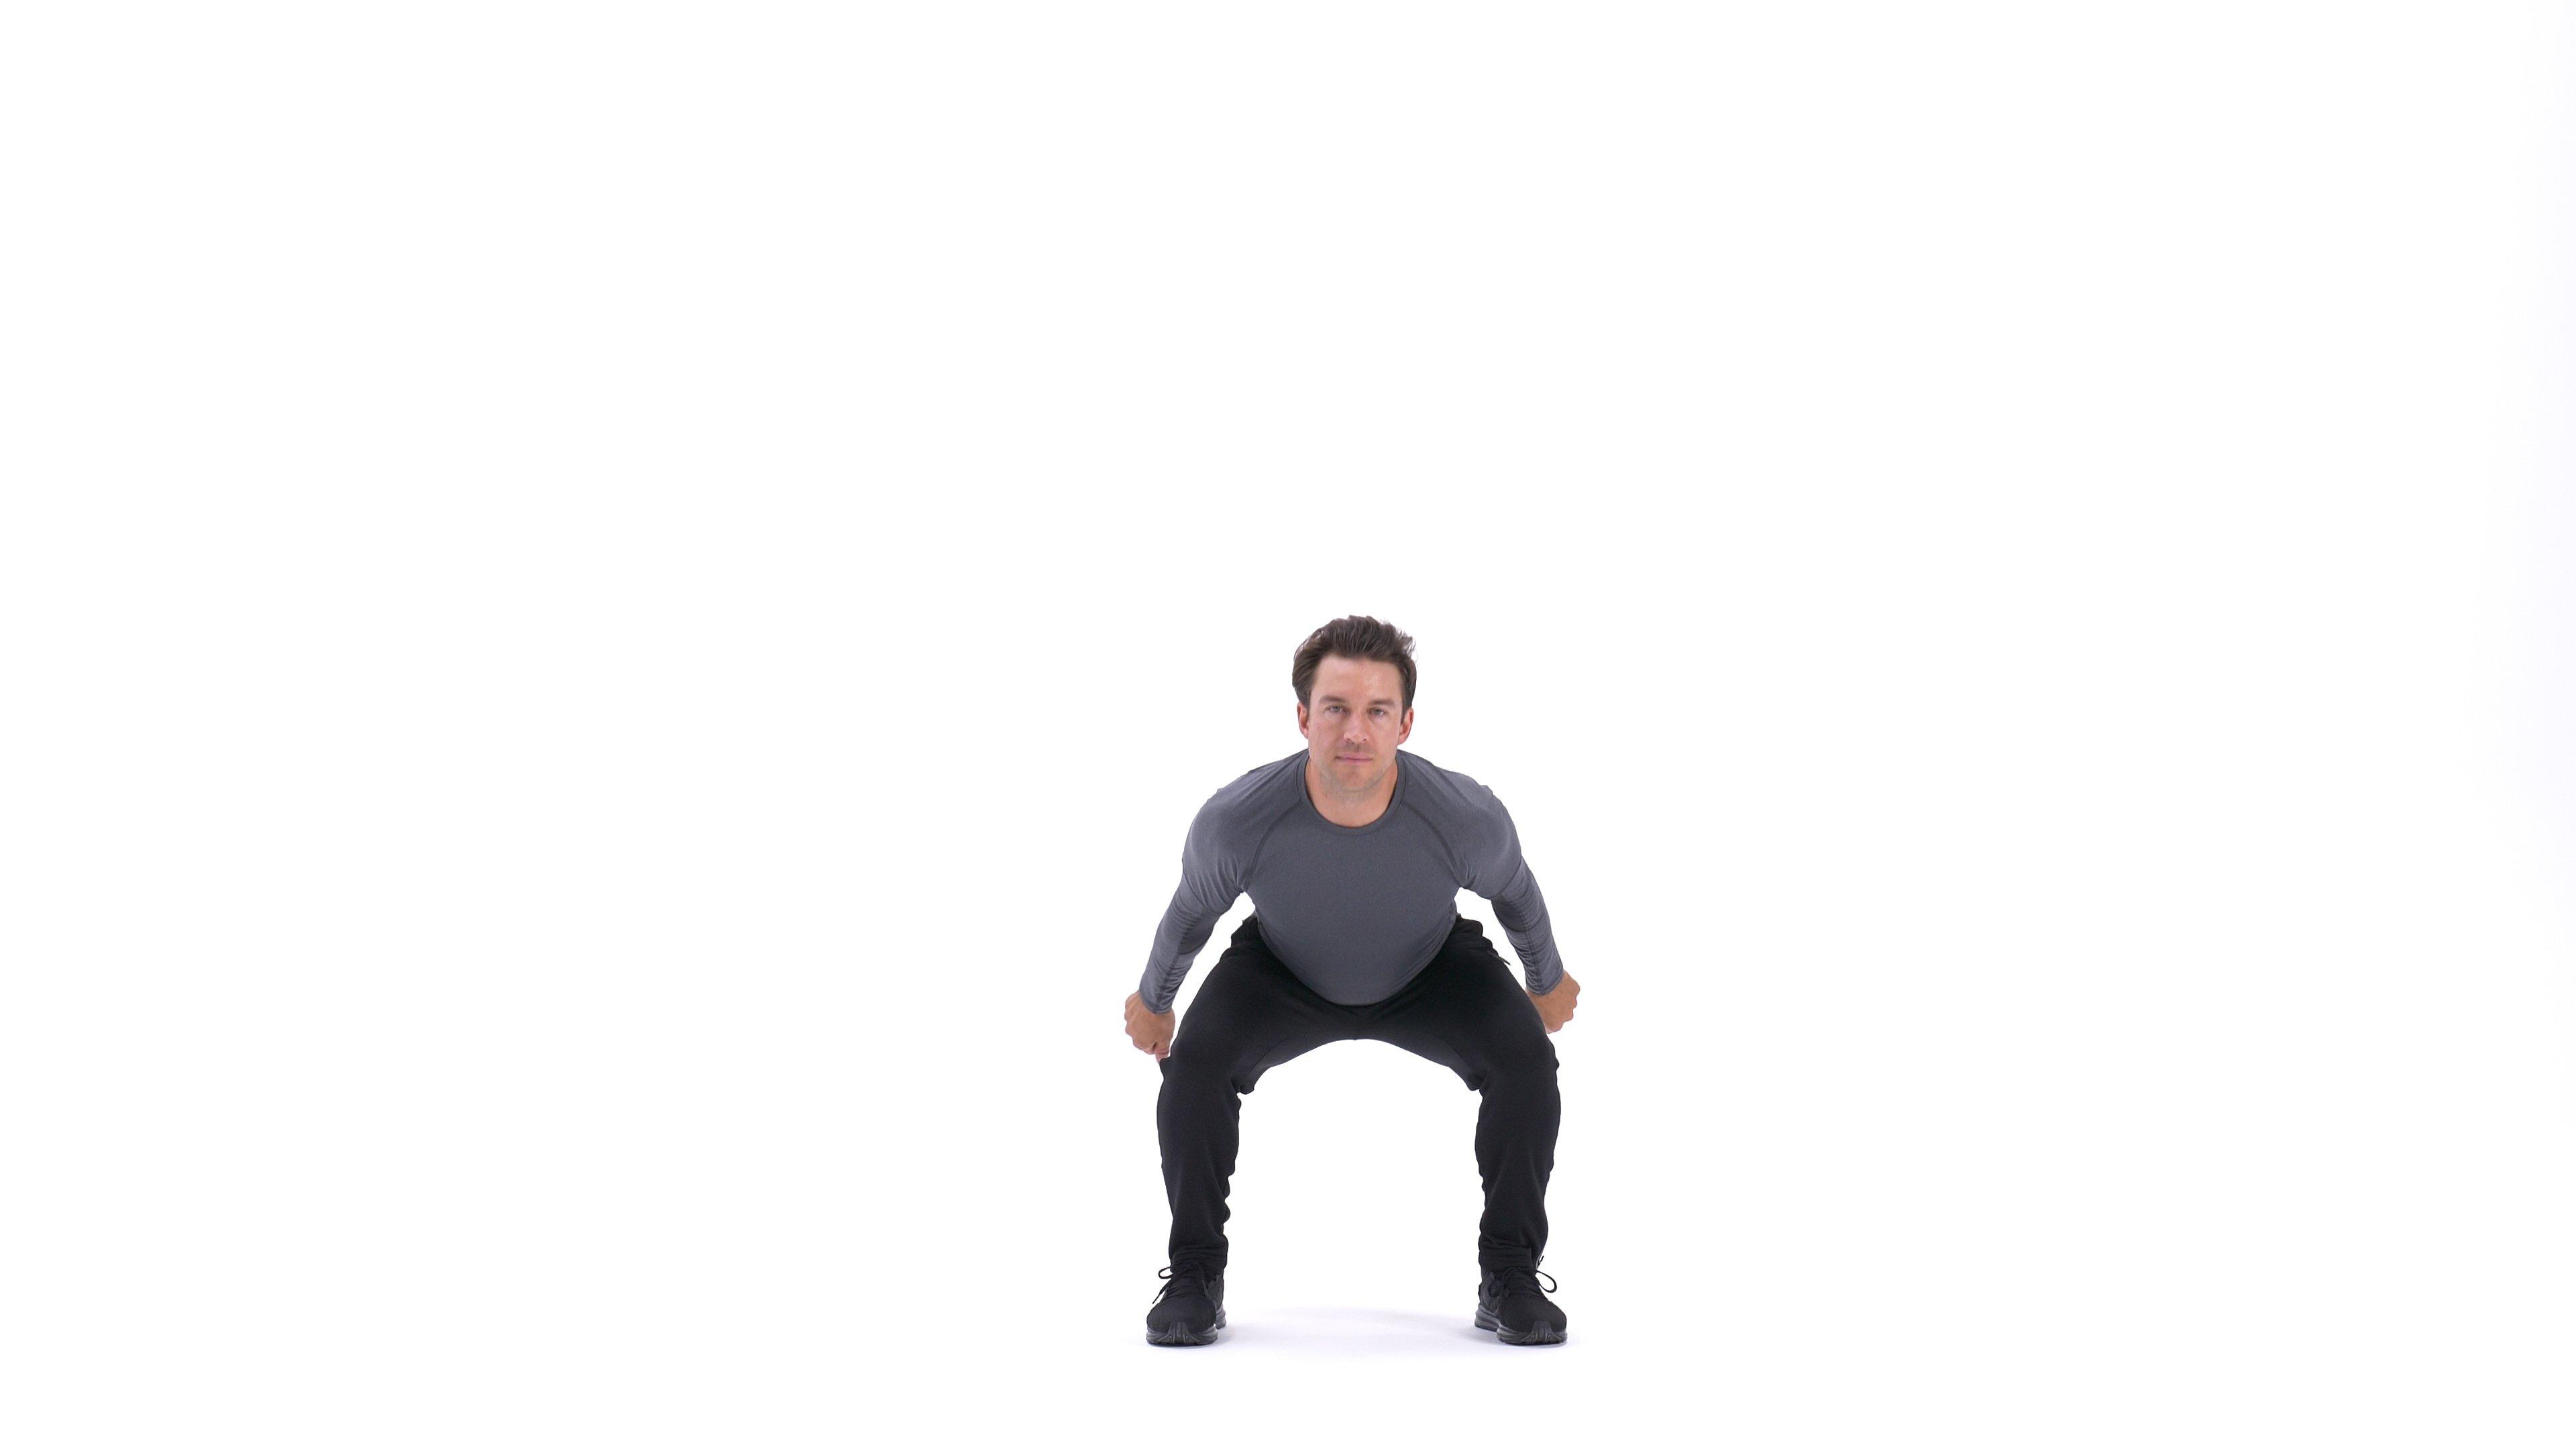 90-degree jump squat image